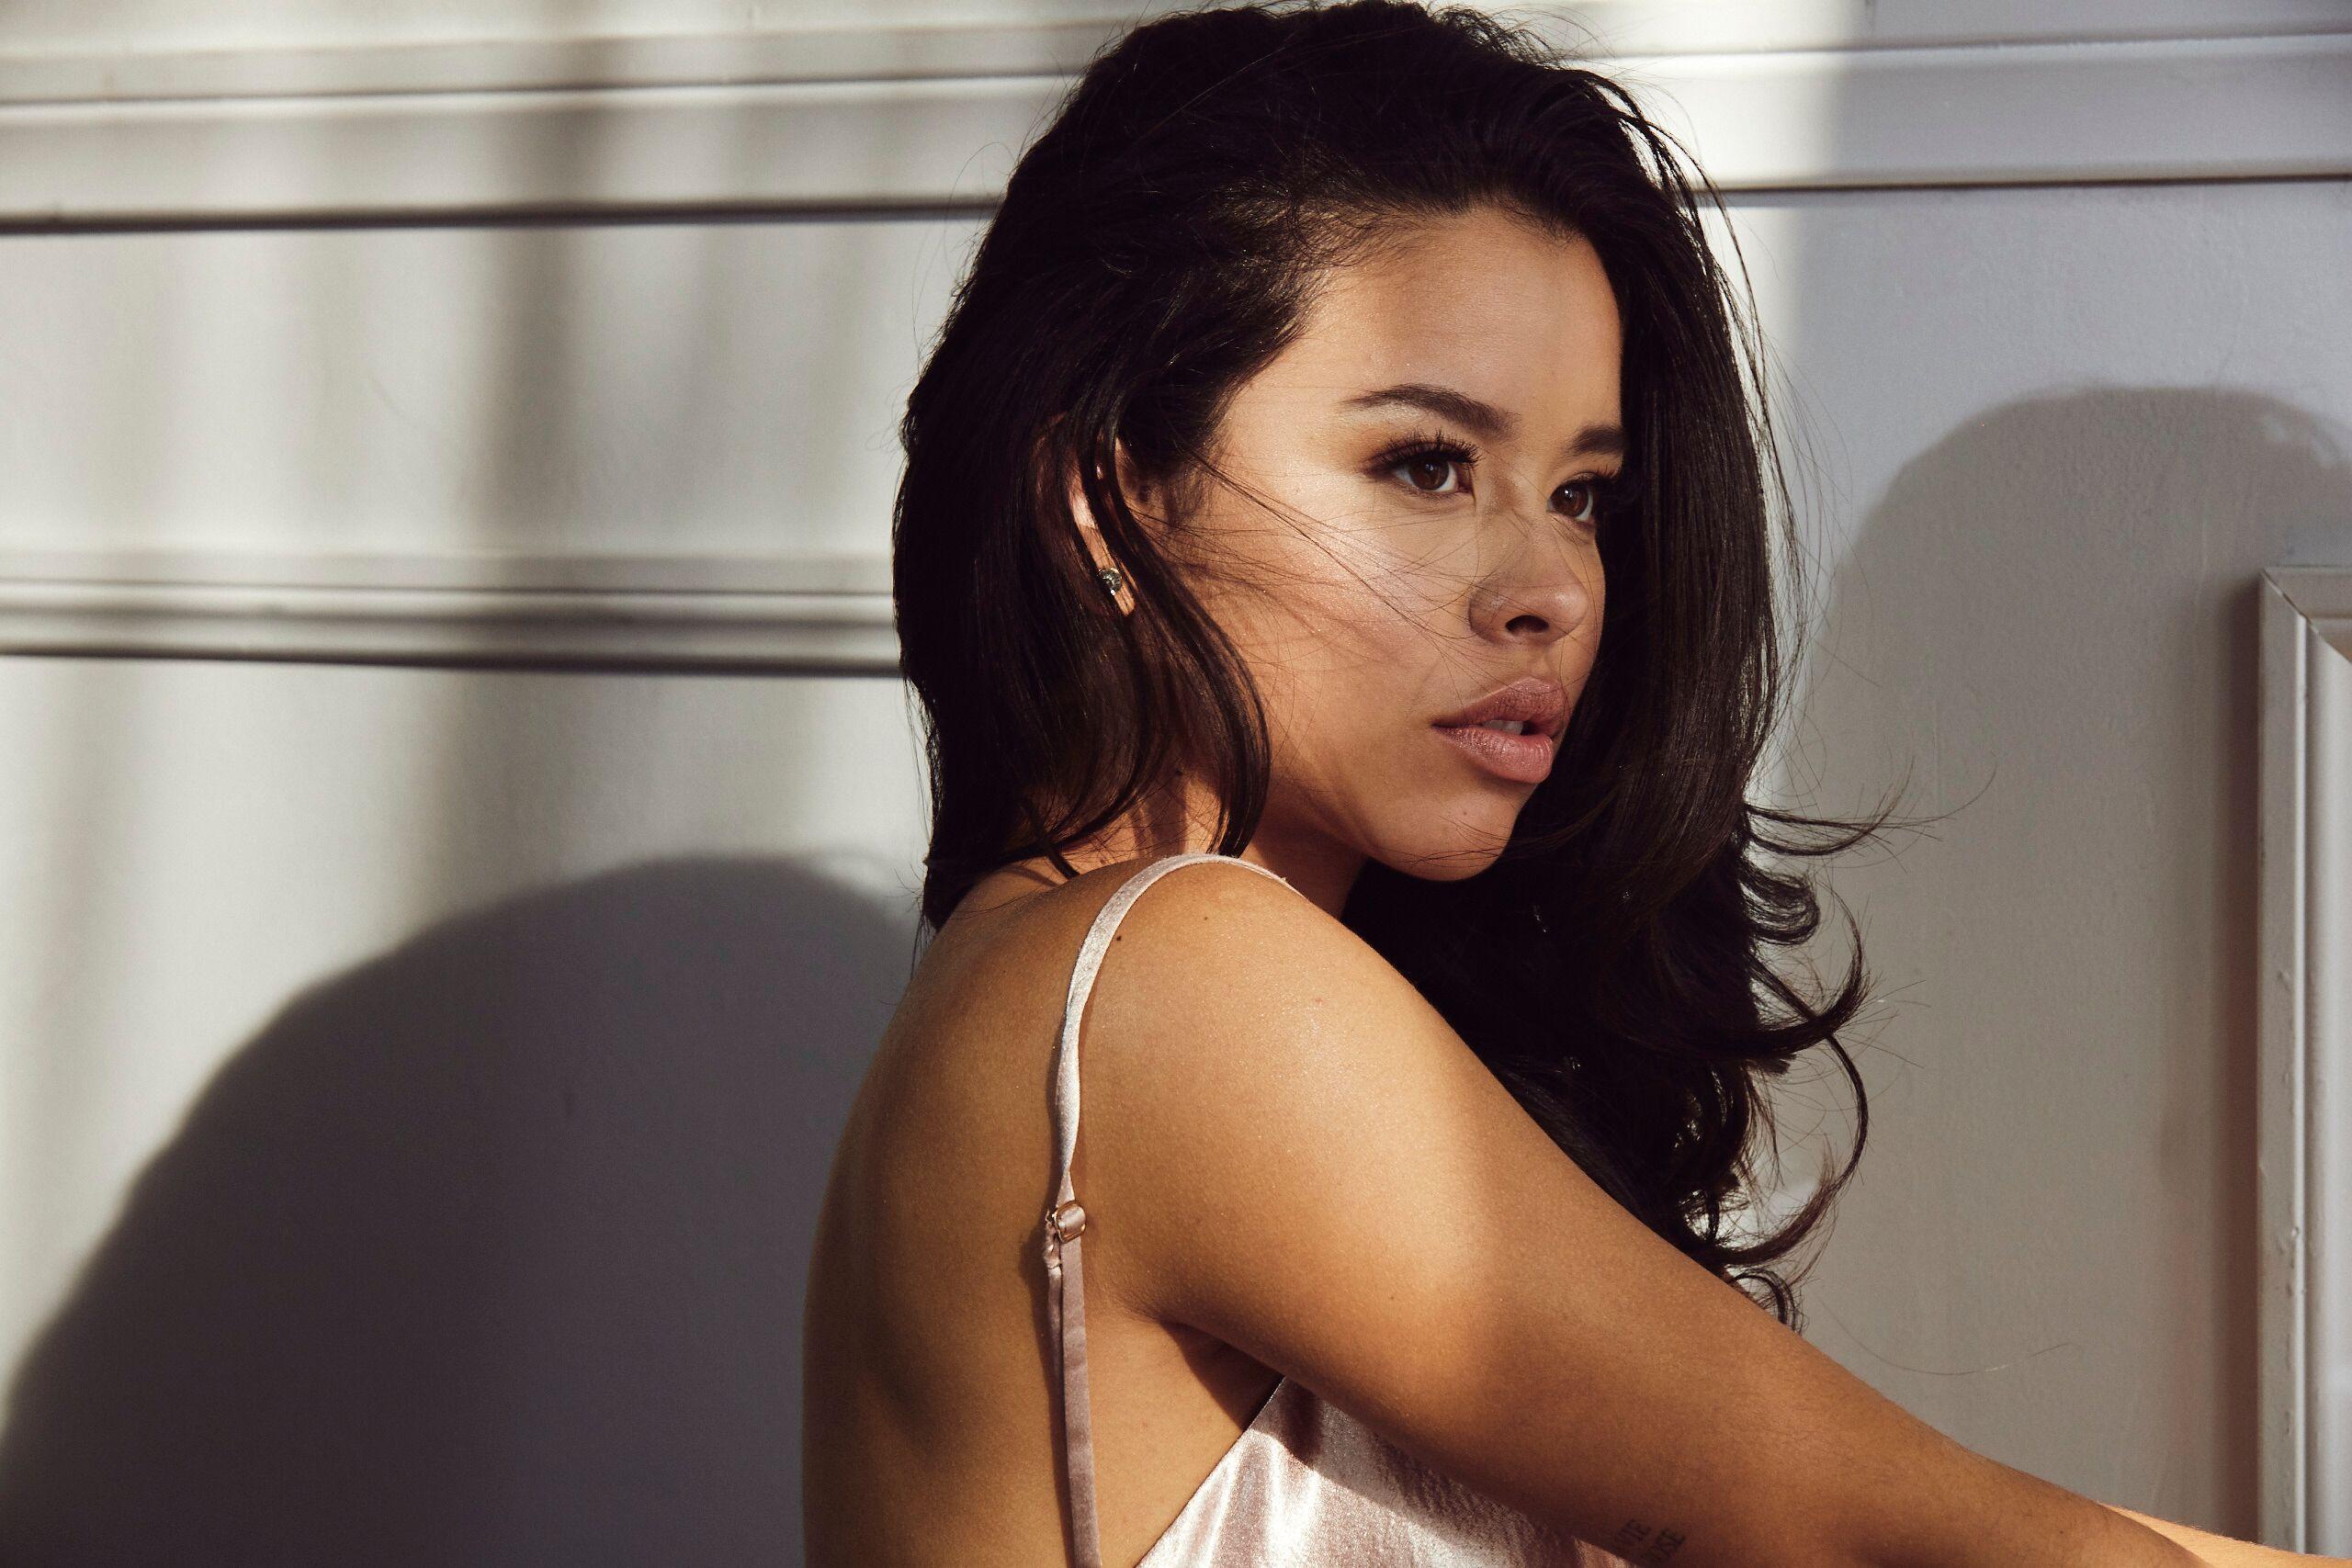 ICloud Cierra Ramirez nudes (91 photos), Topless, Hot, Twitter, in bikini 2015